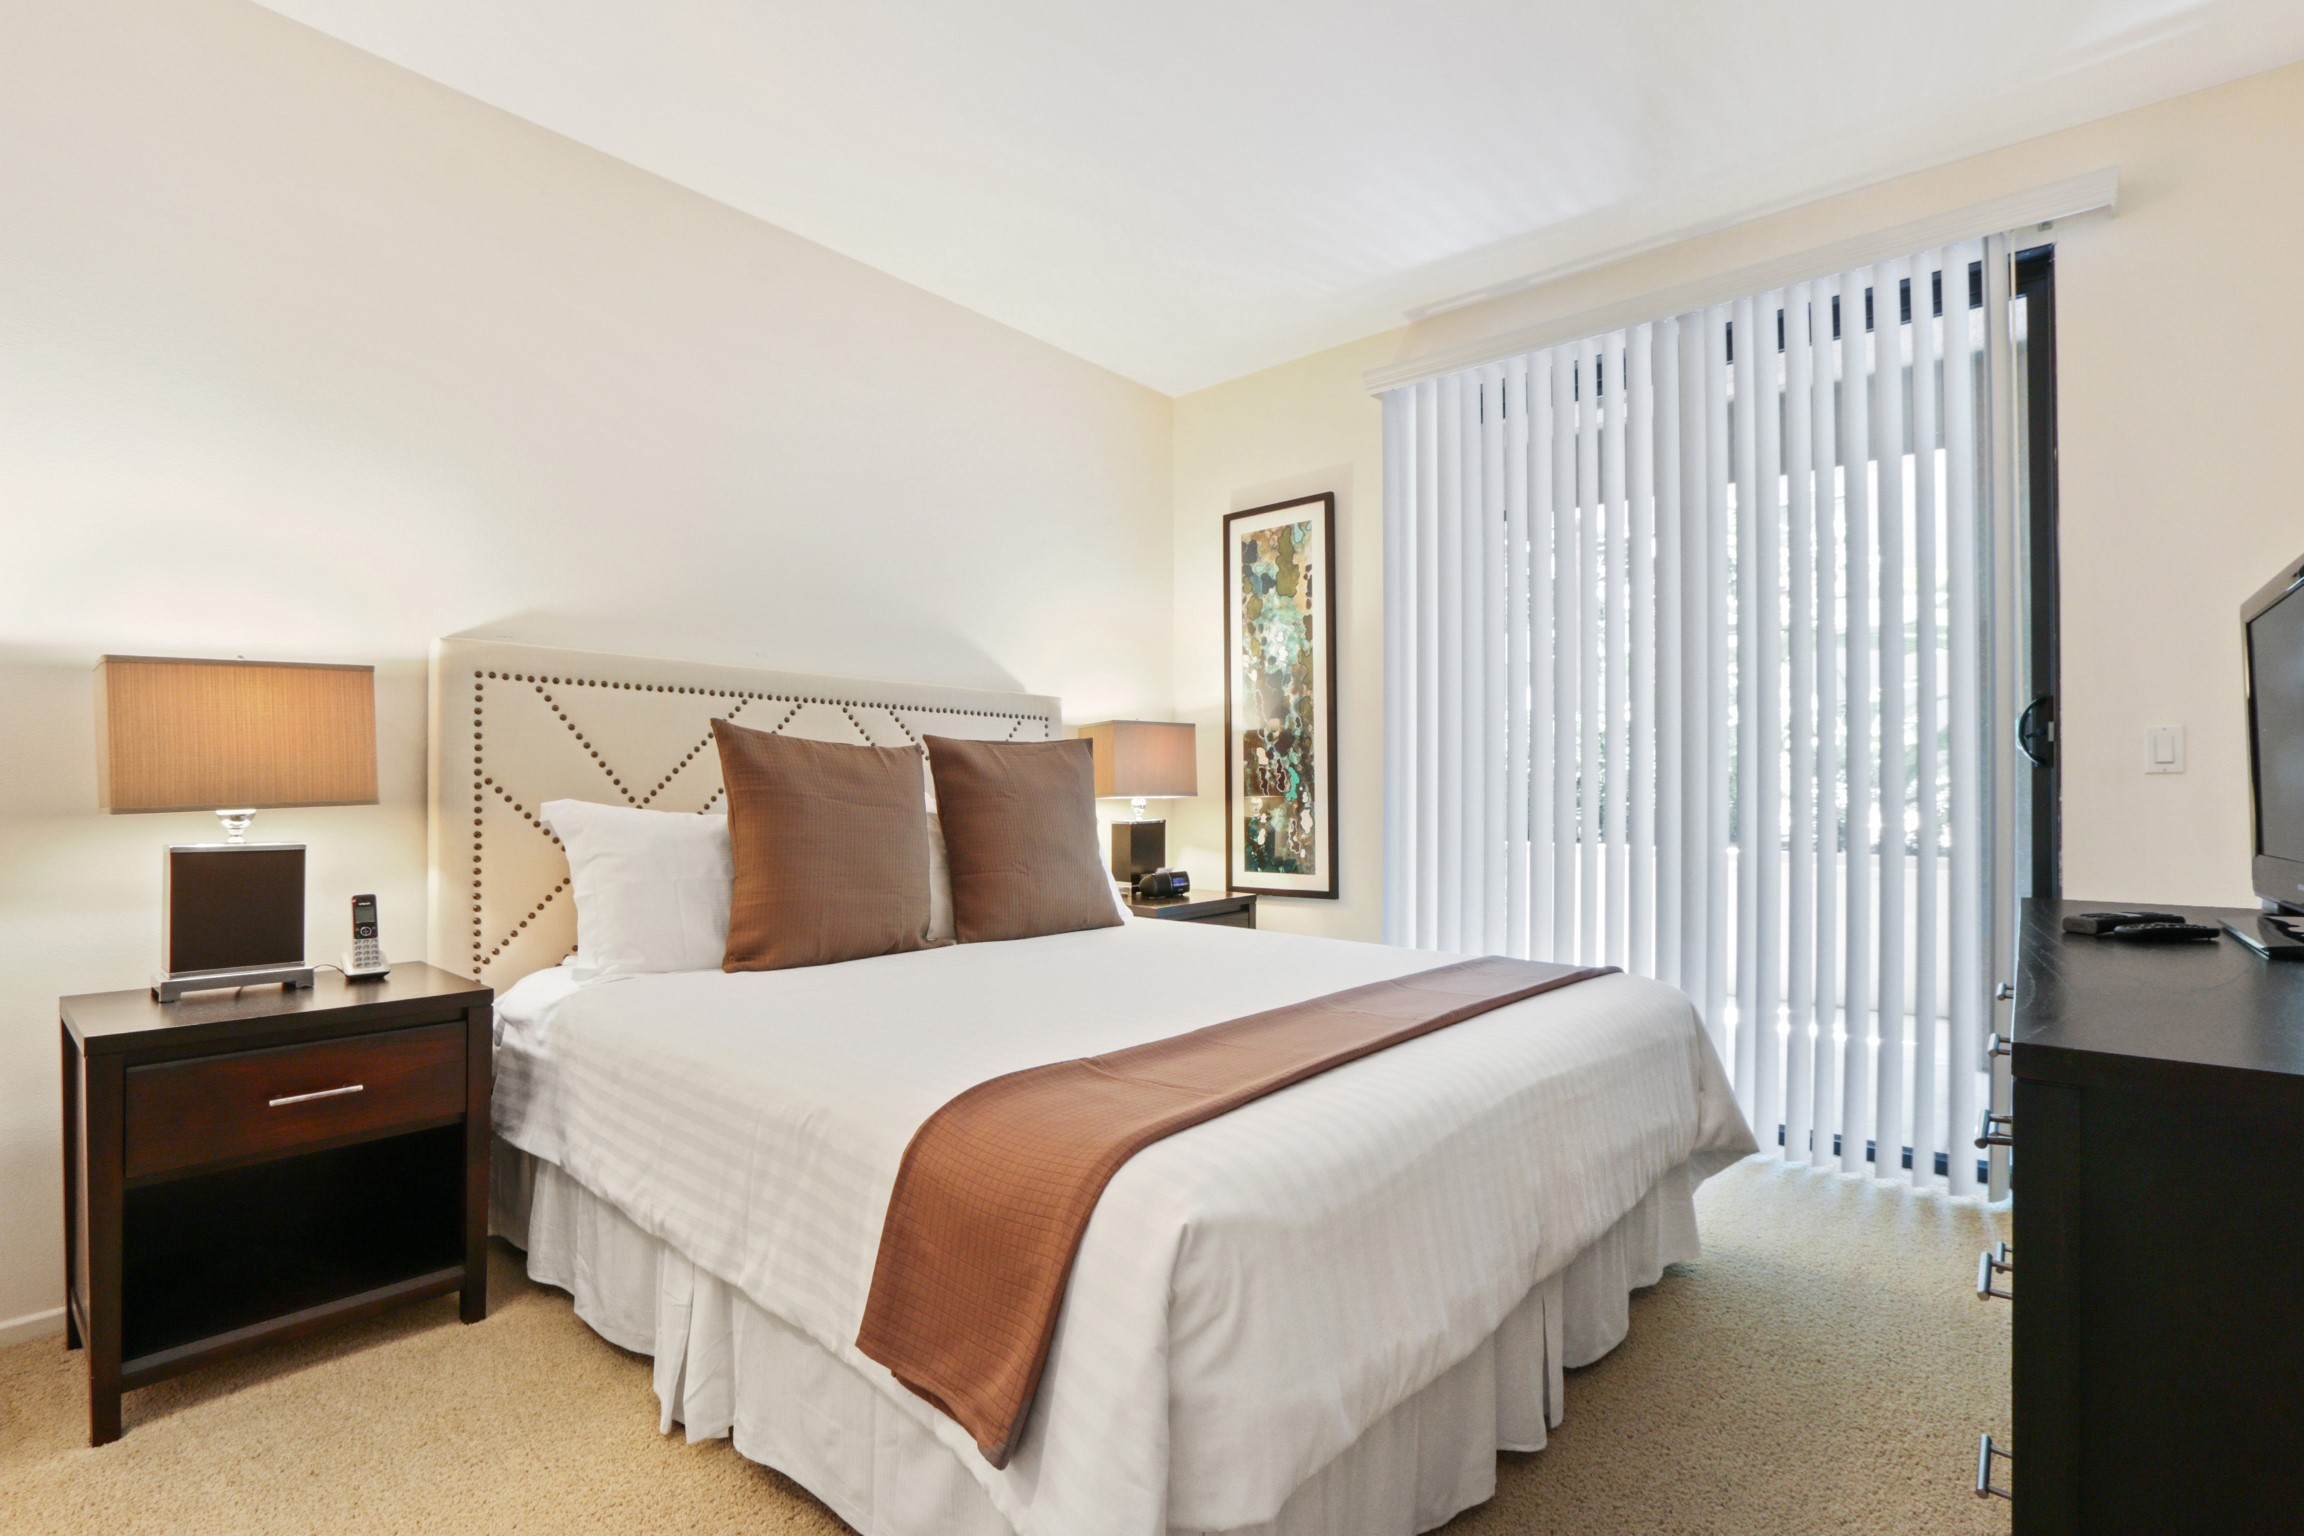 image 8 furnished 1 bedroom Apartment for rent in Irvine, Orange County